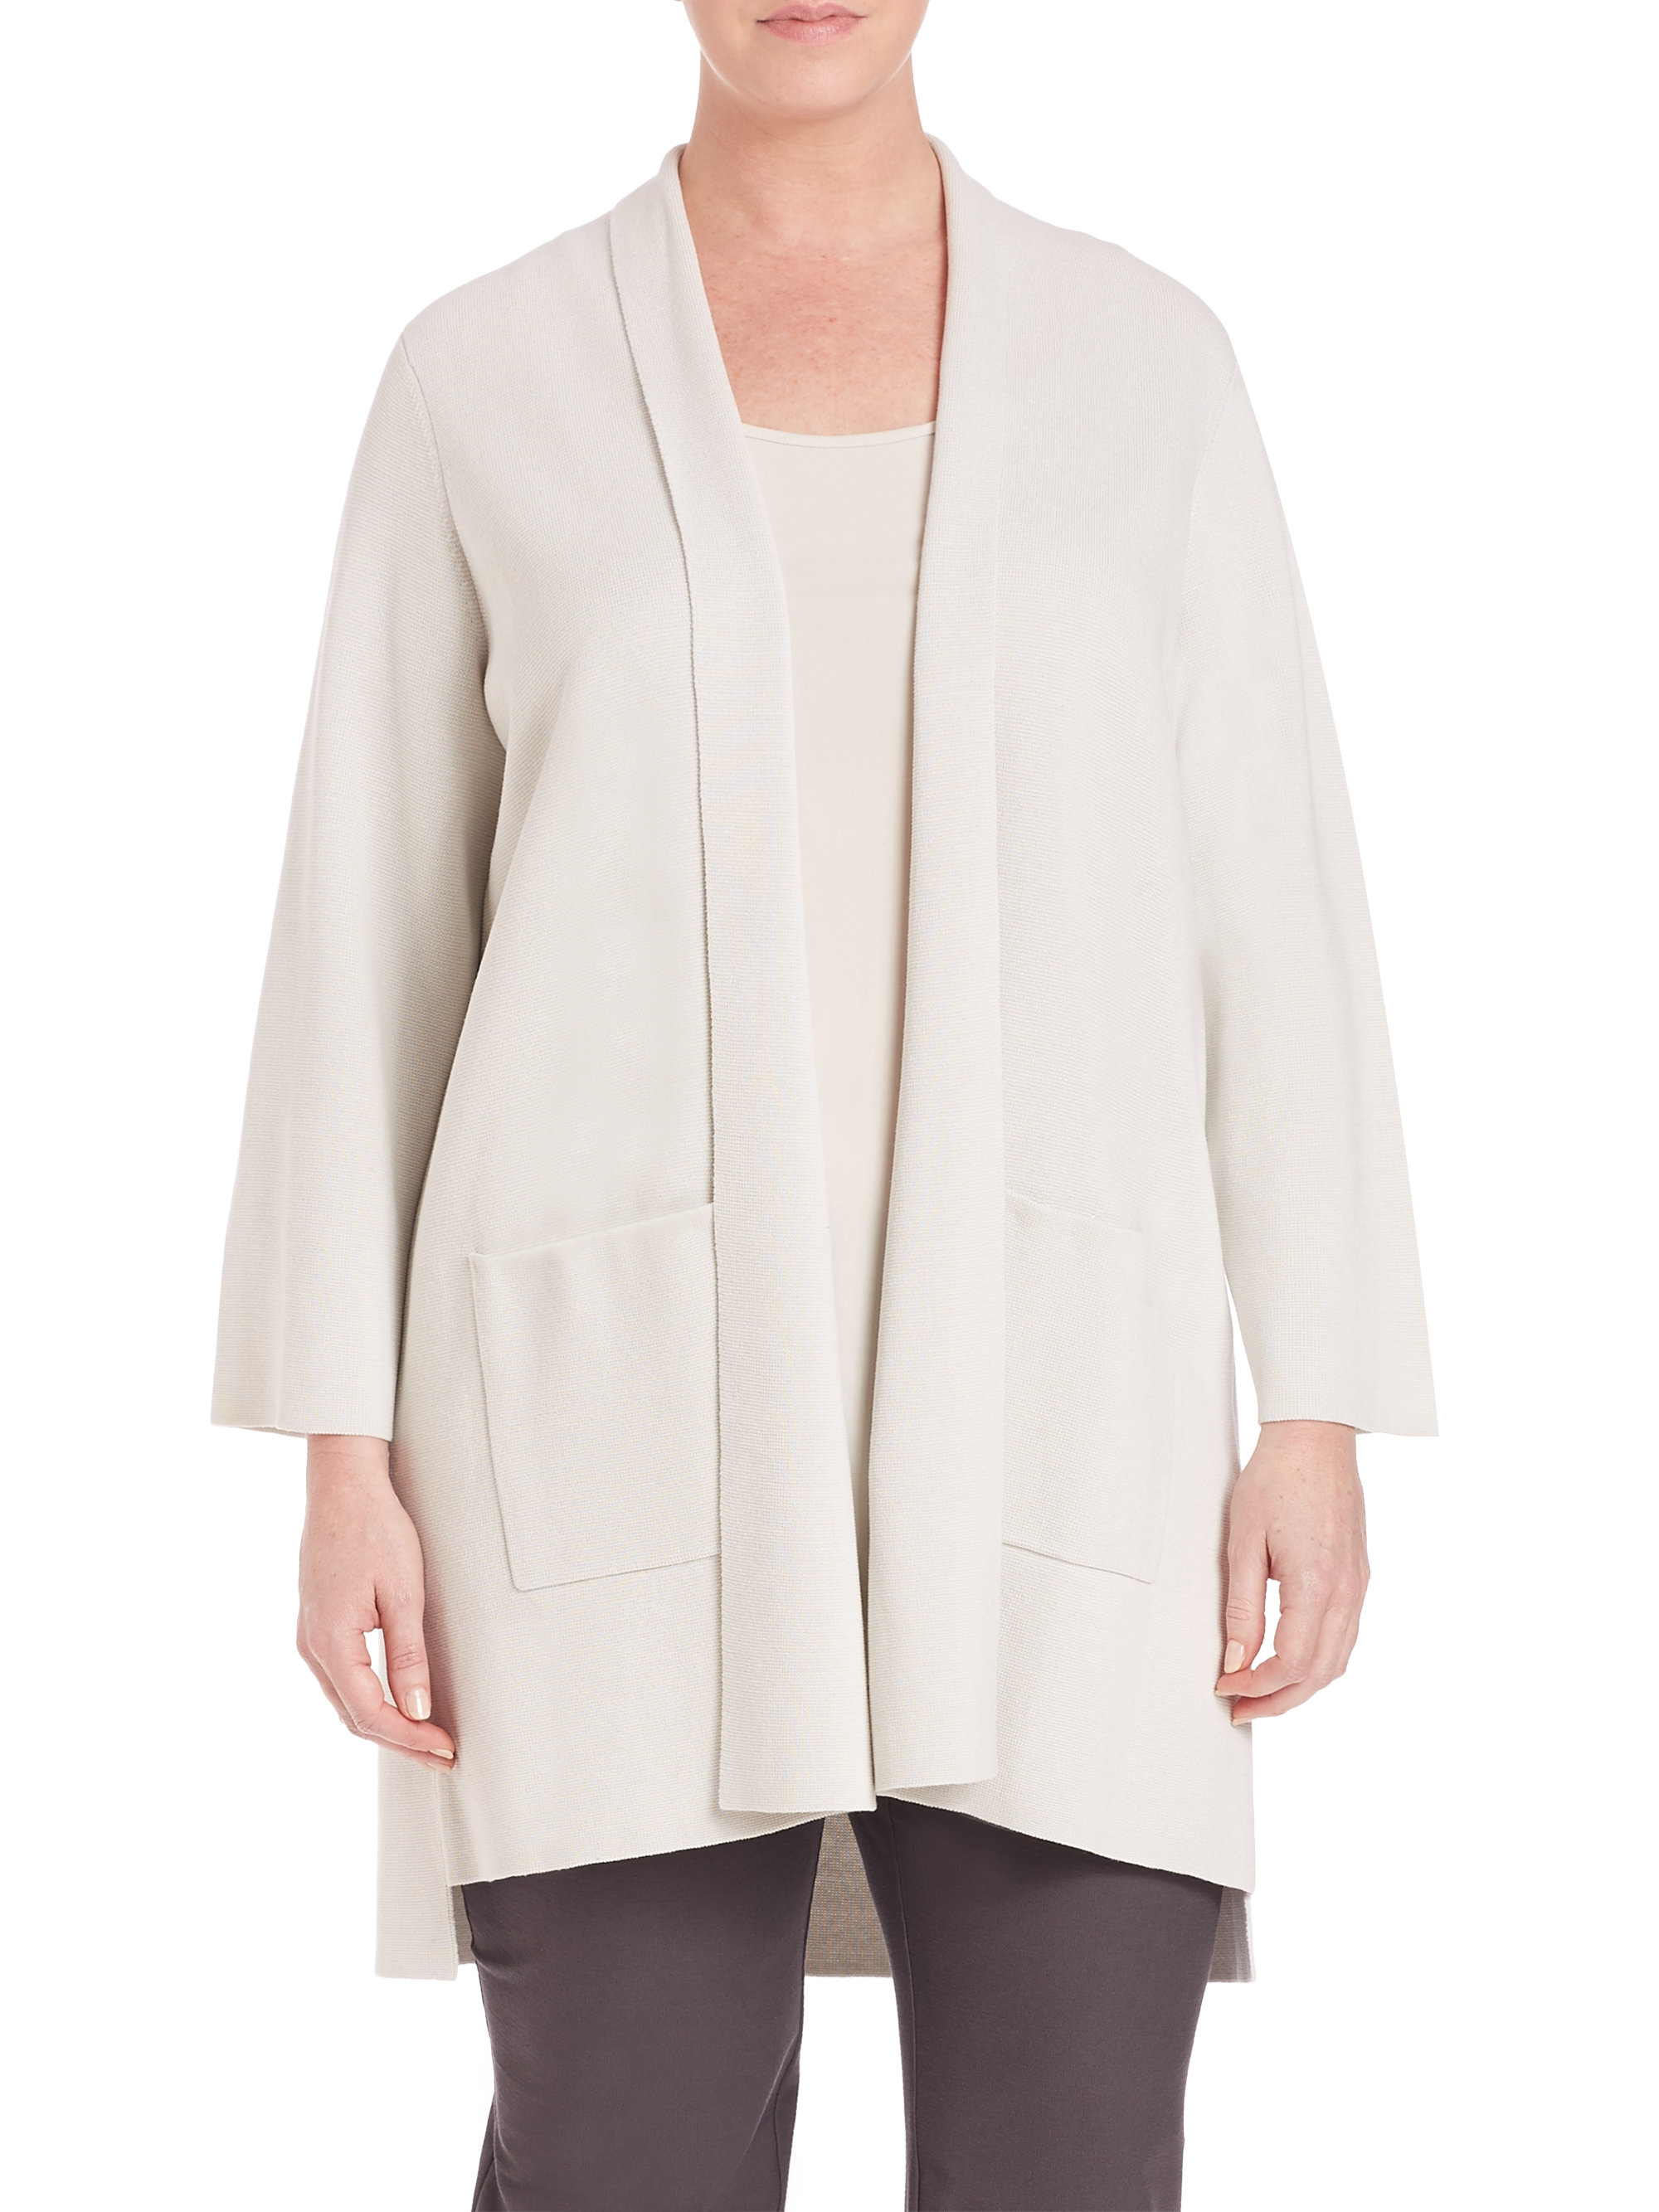 Eileen fisher Silk & Cotton Interlock Kimono Cardigan in Black | Lyst